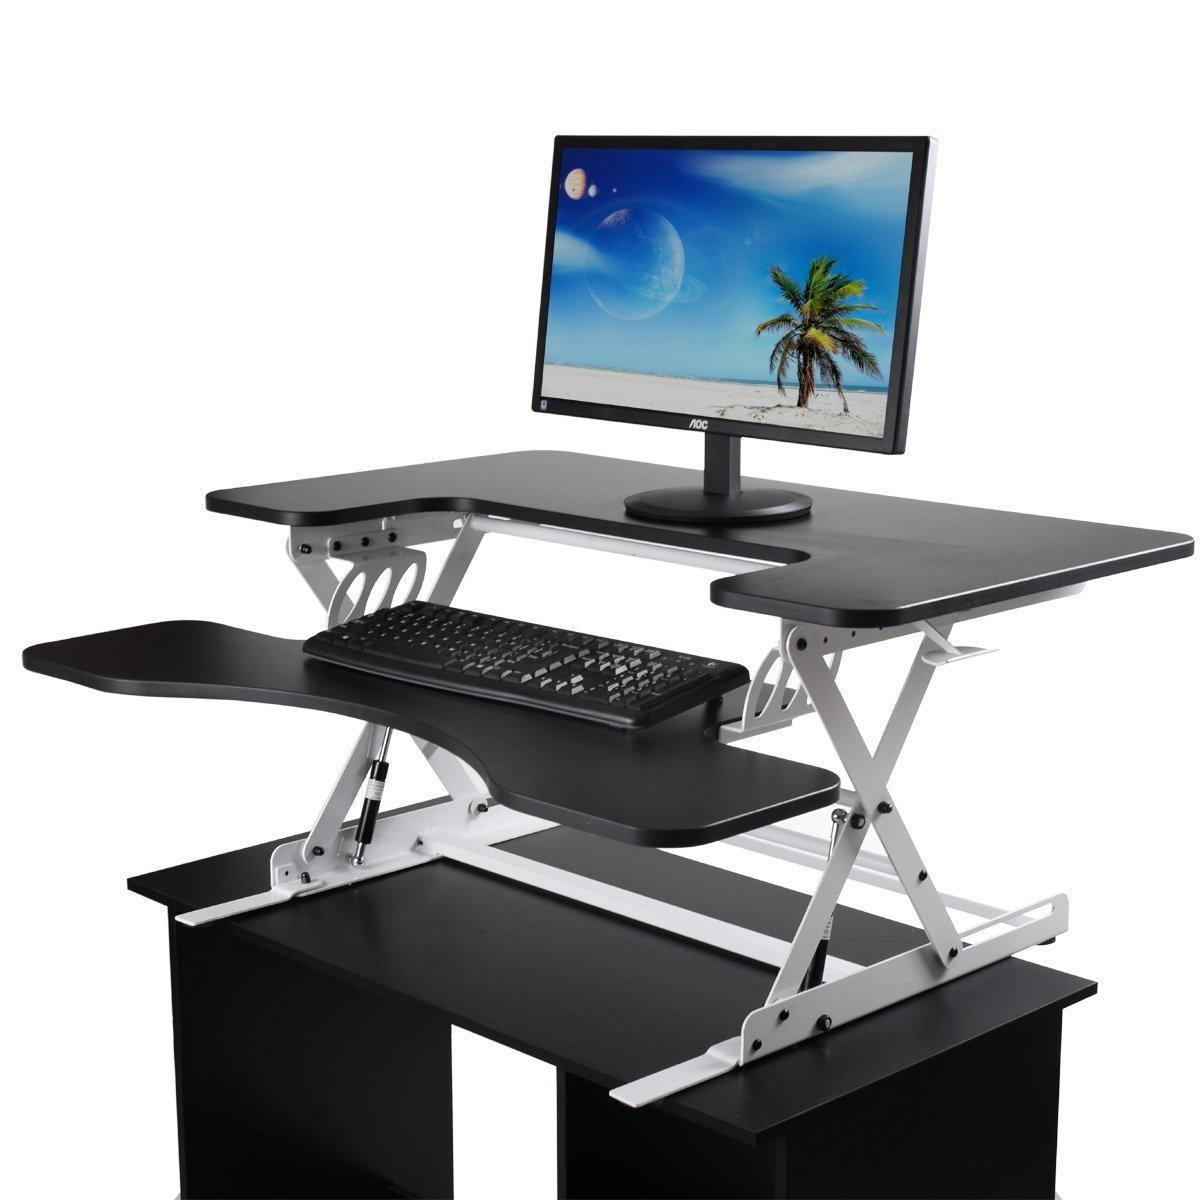 "LAZYMOON Ergonomic 36""Wide Preassembled Height Adjustable Standing Desk Riser/ Stand Workstation Elevating Desktop Removable Keyboard Tray, Black & White"